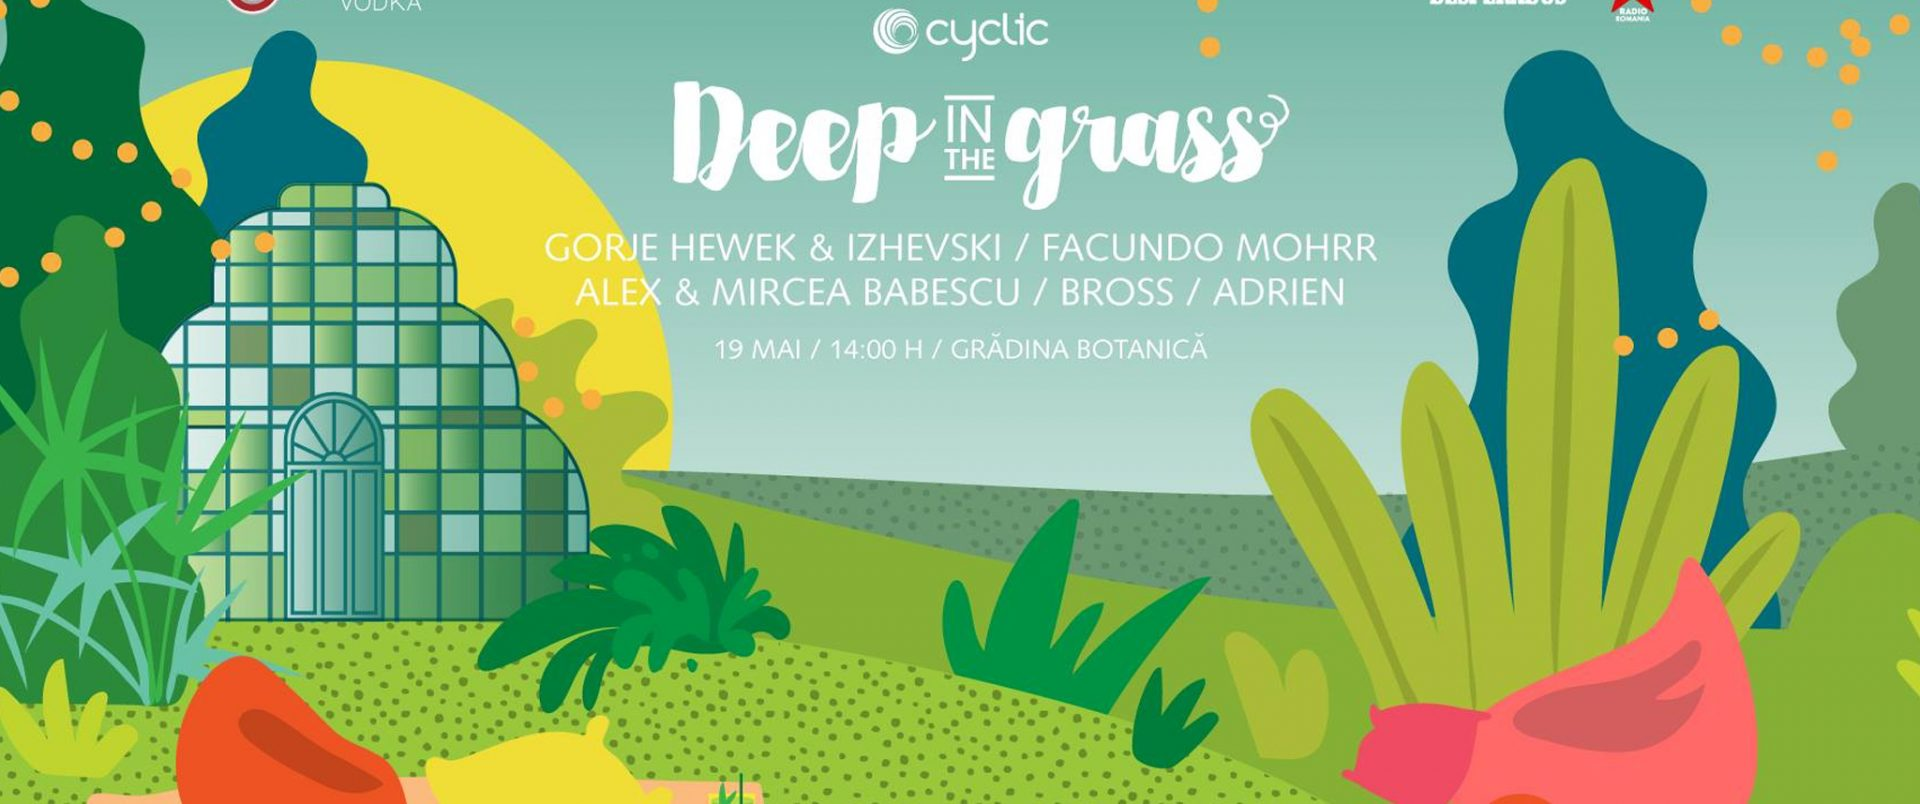 Deep In the Grass / 19.05 / Gradina Botanica